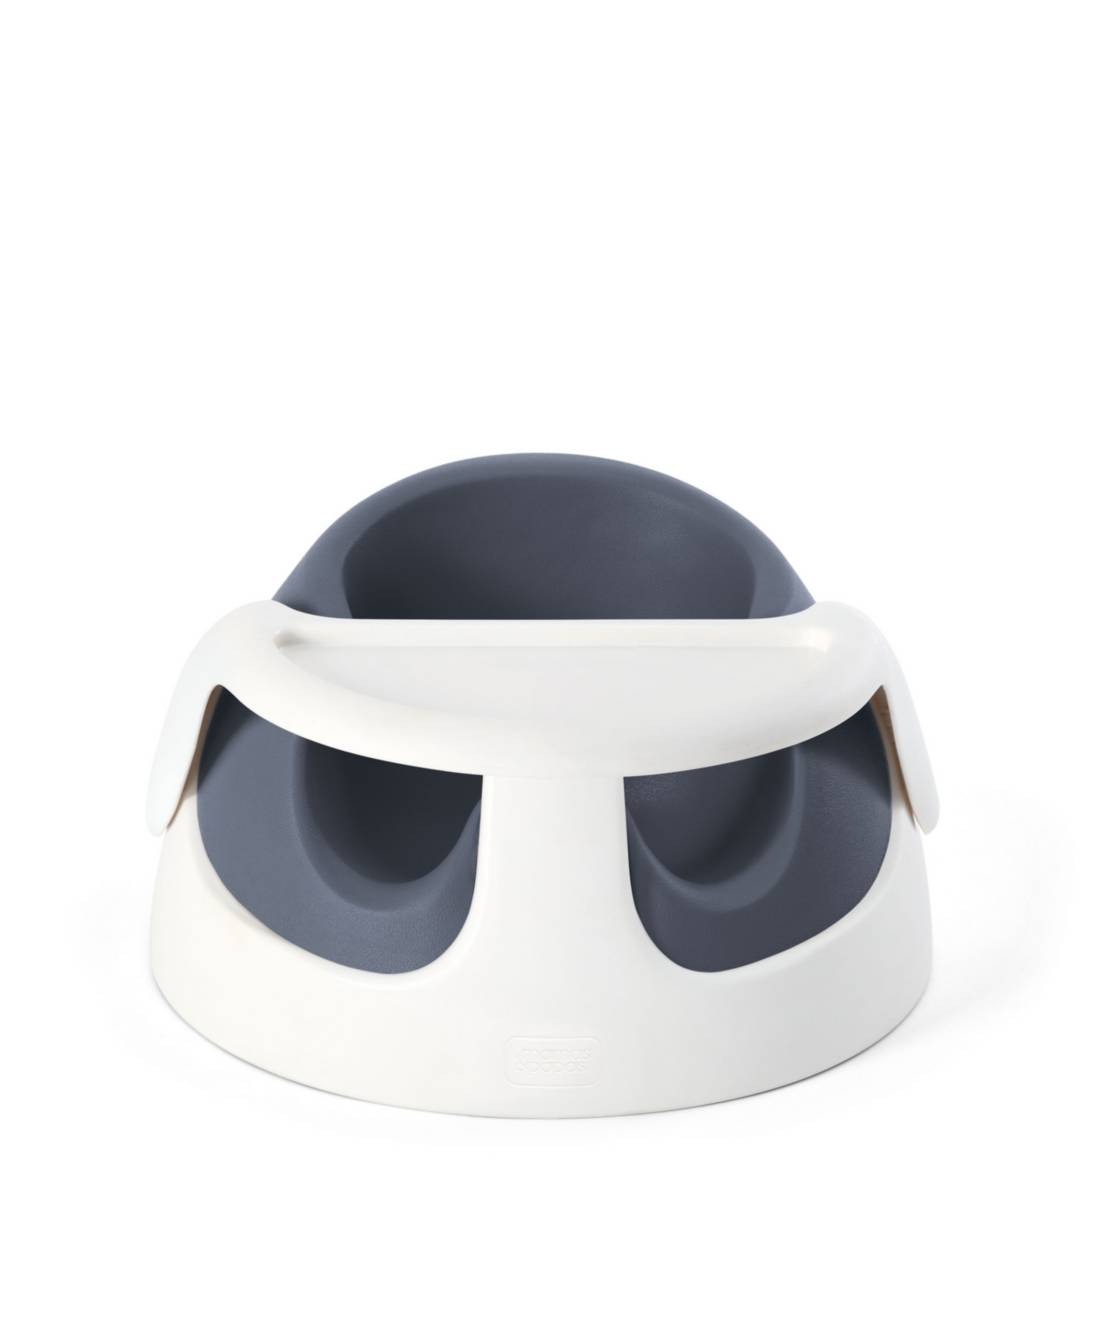 Mamas & Papas Snug Booster Seat/ Highchair - Navy